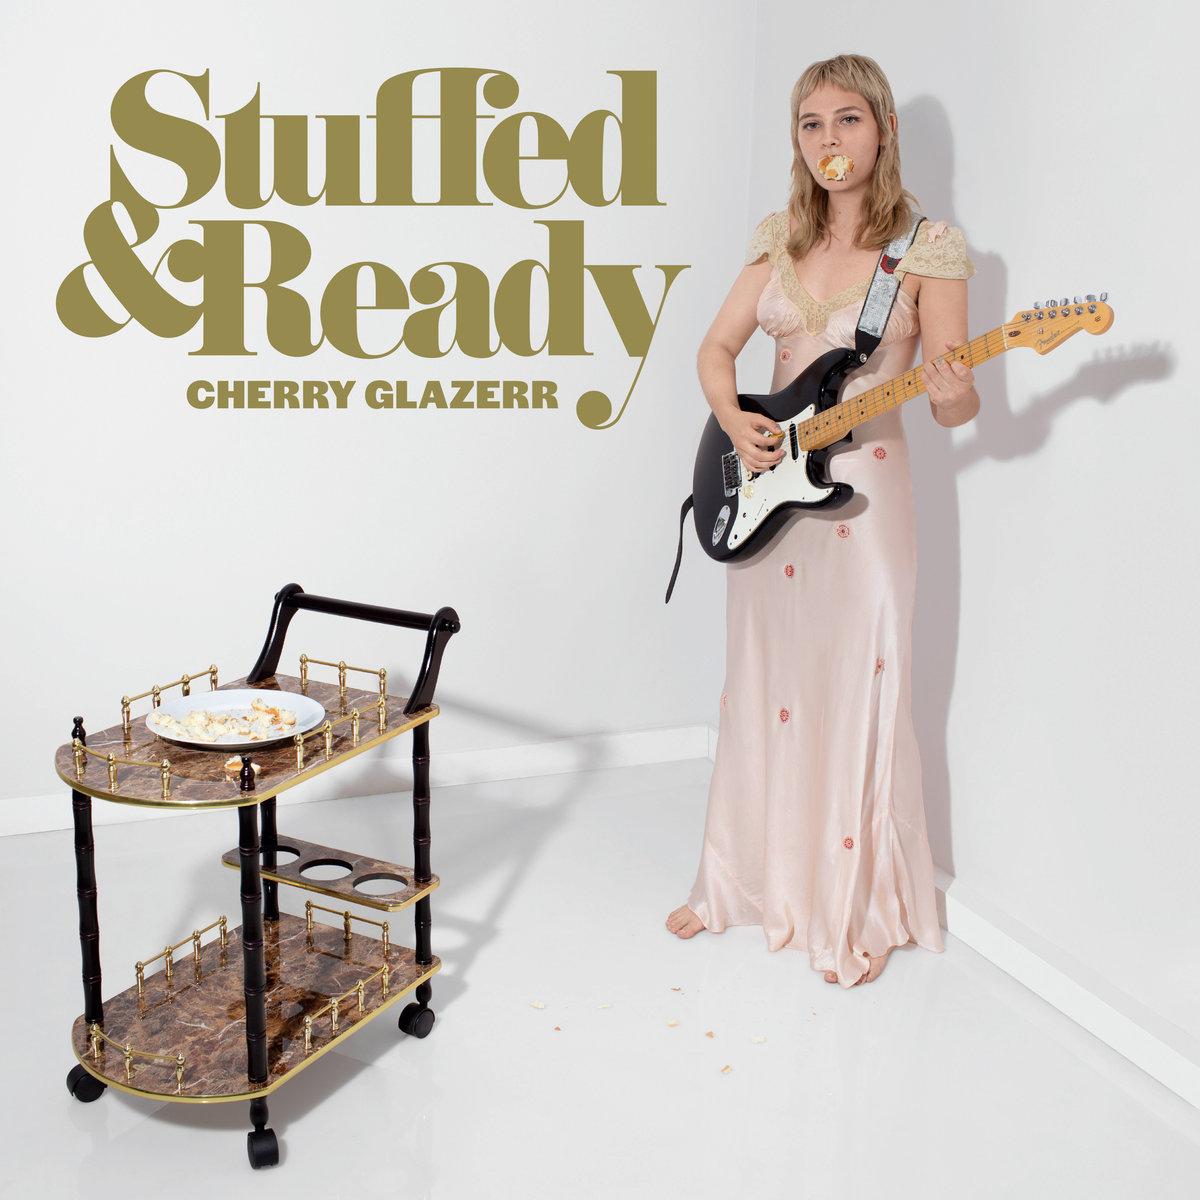 Cherry Glazerr: Stuffed and Ready